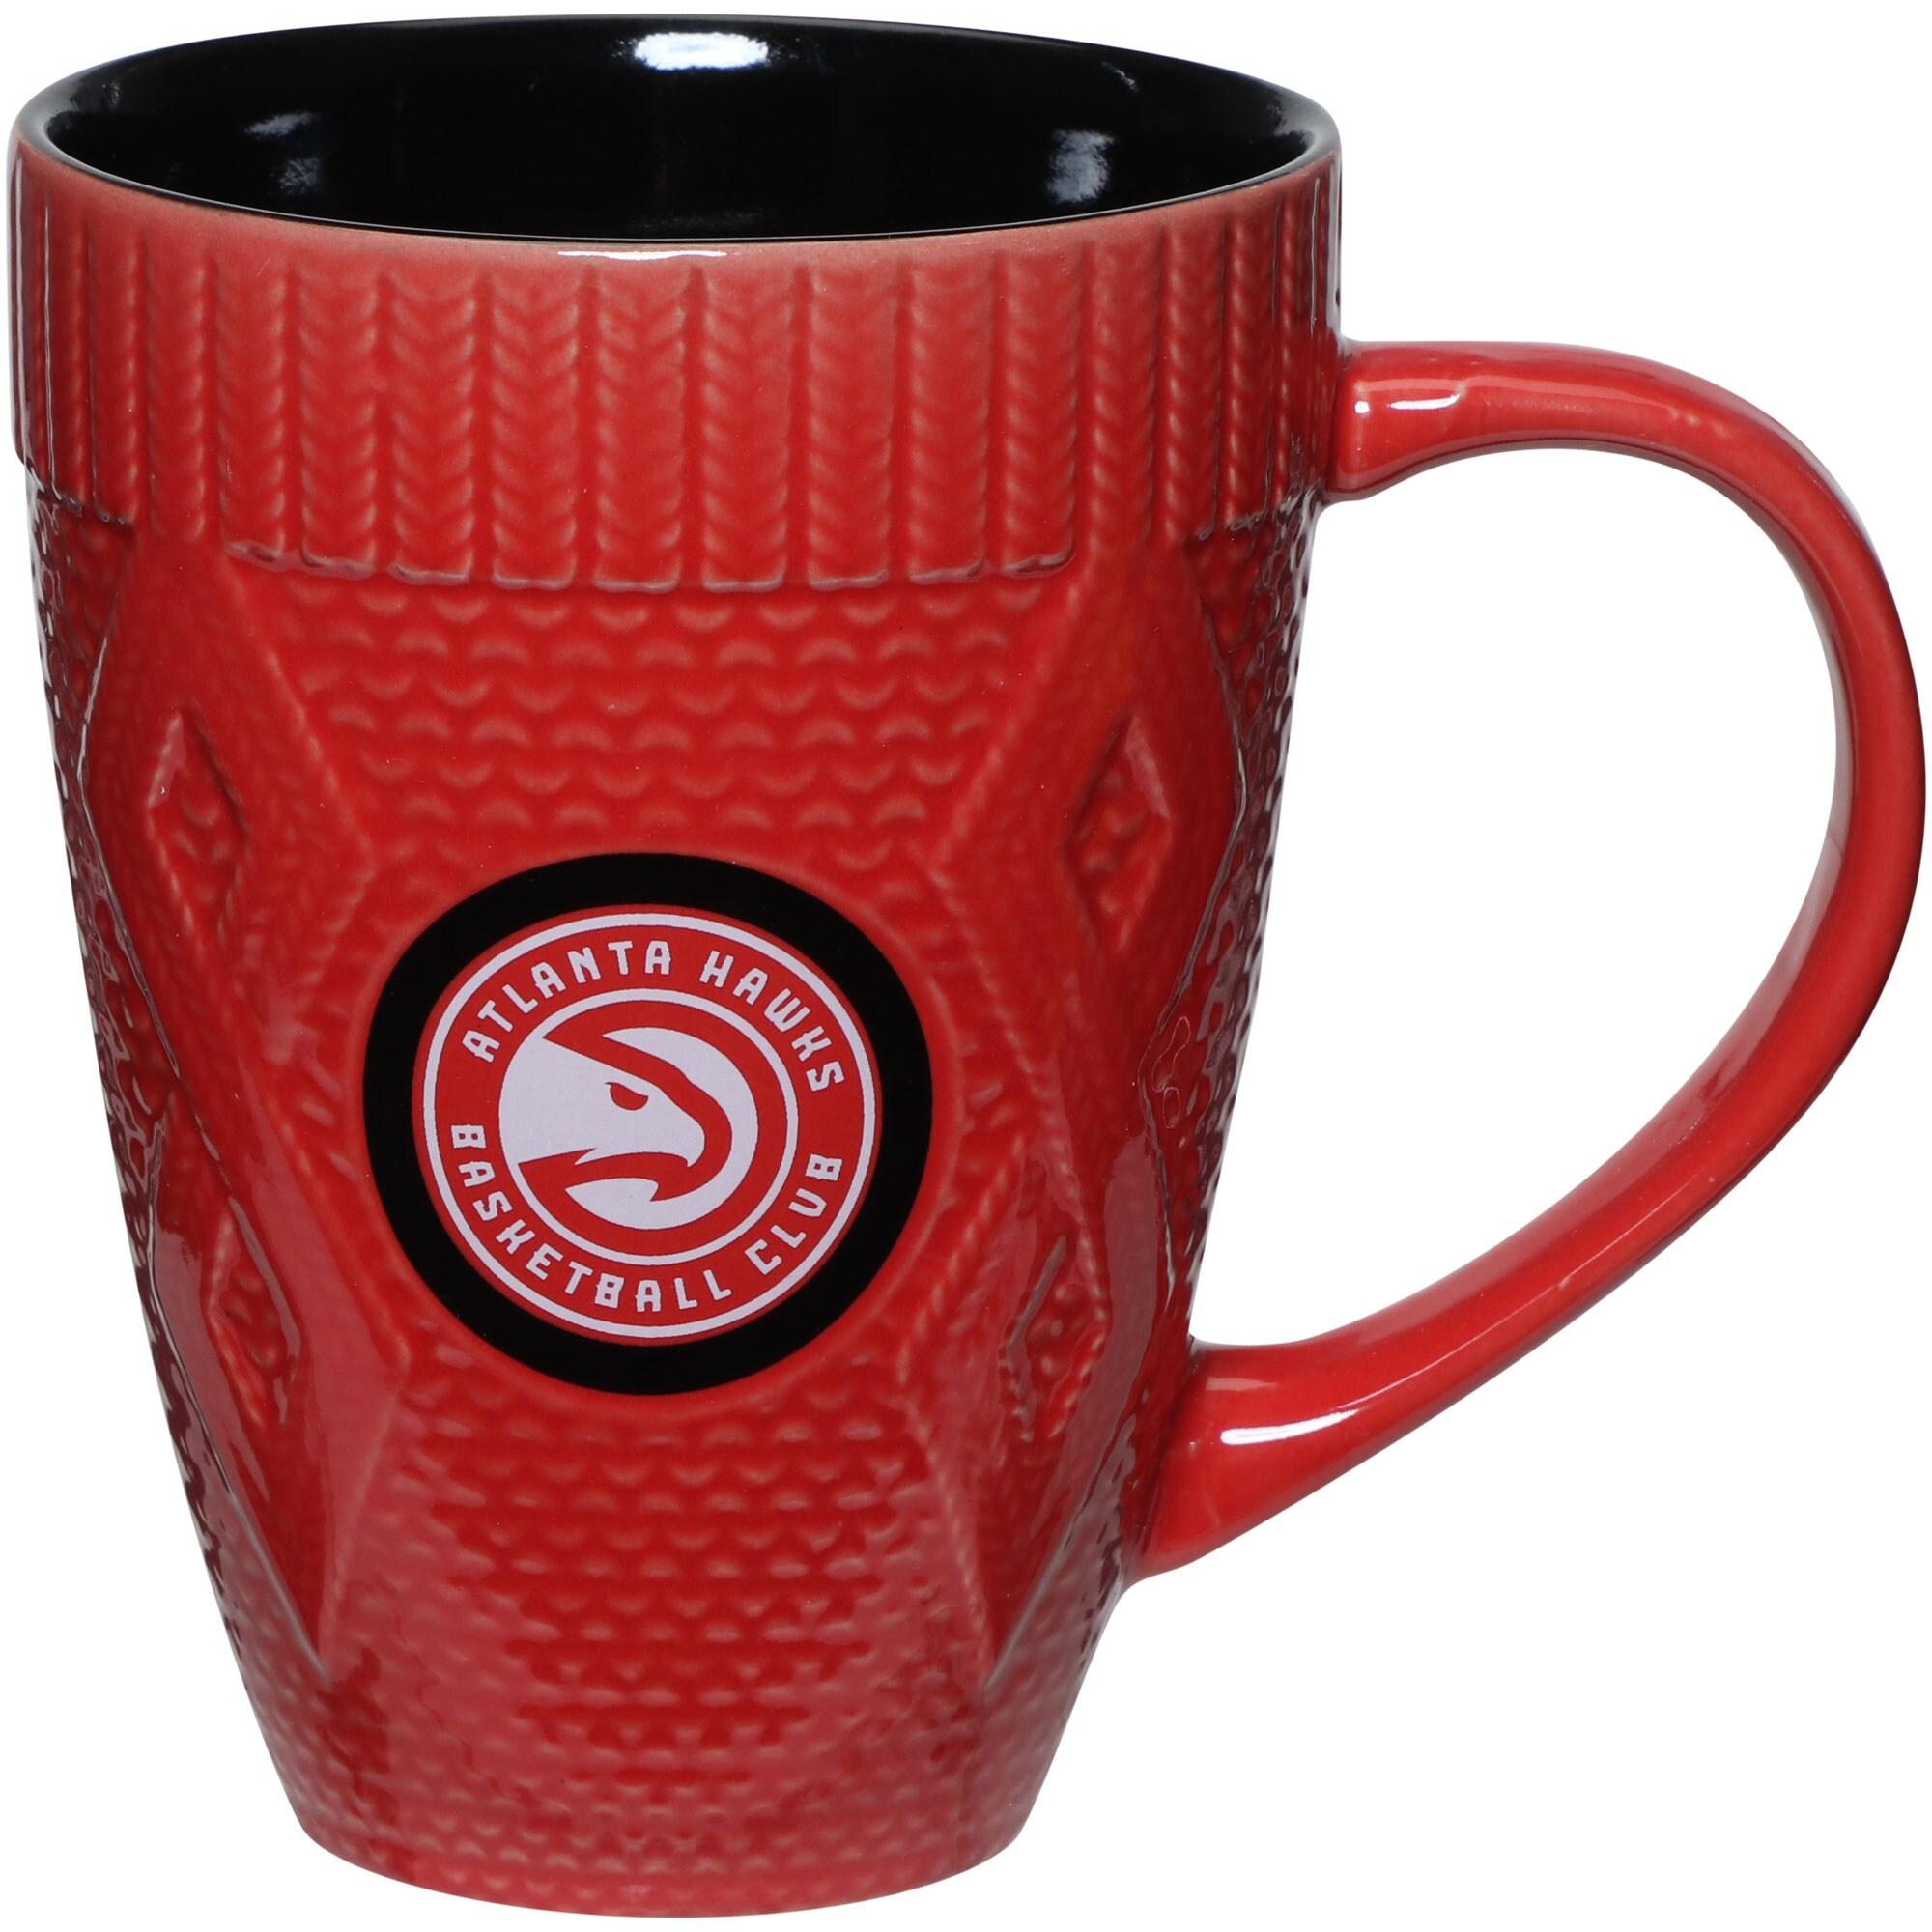 Atlanta Hawks 16oz. Sweater Mug